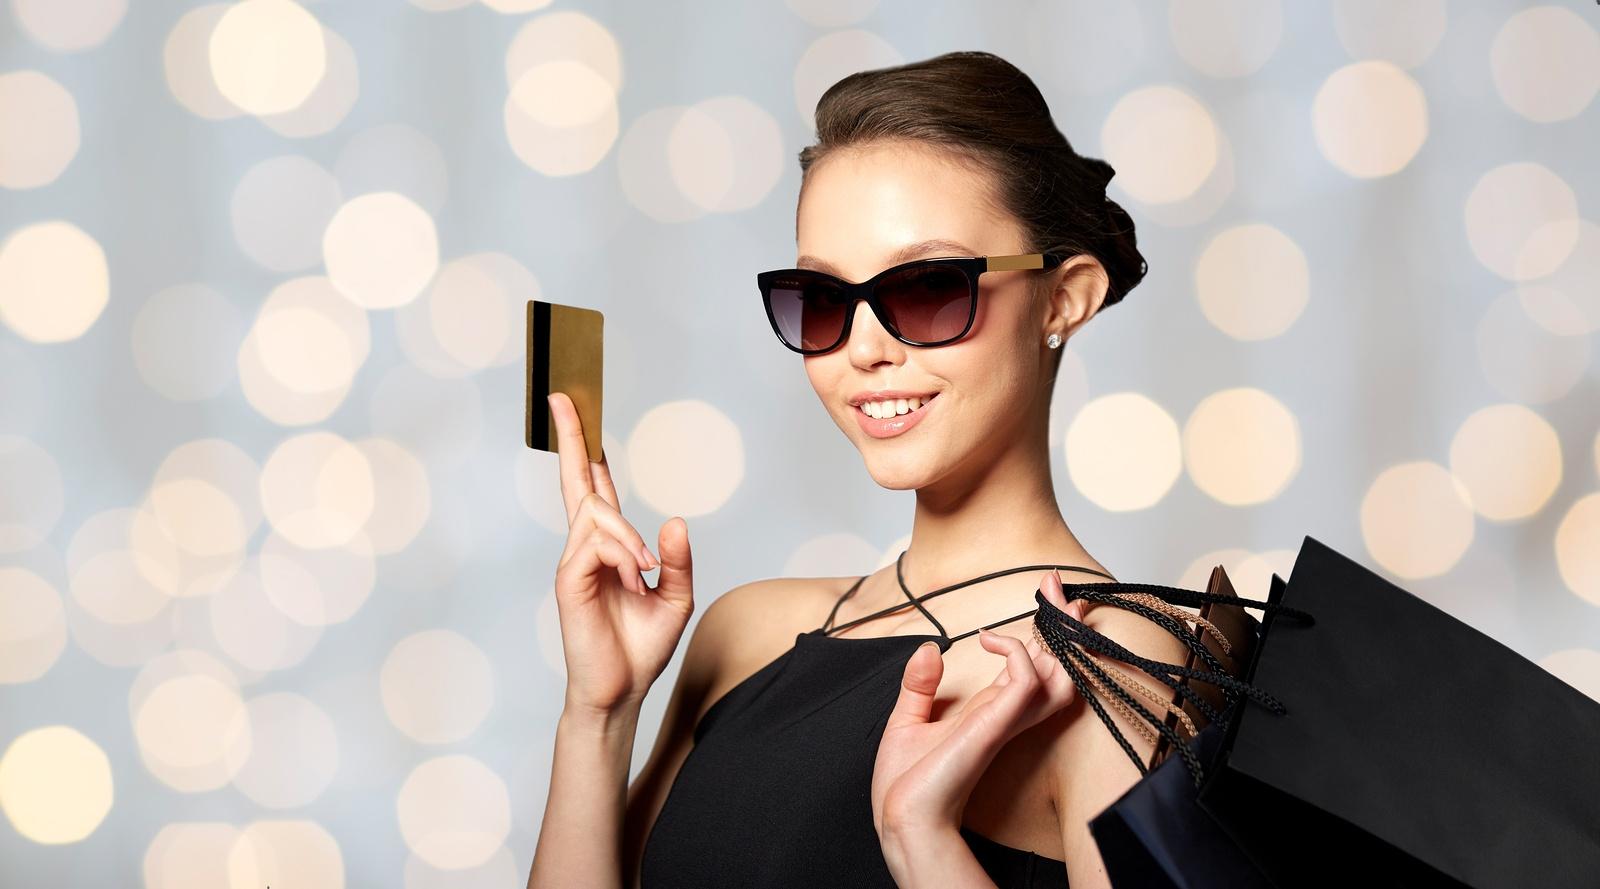 bigstock-sale-finances-fashion-peopl-136174994